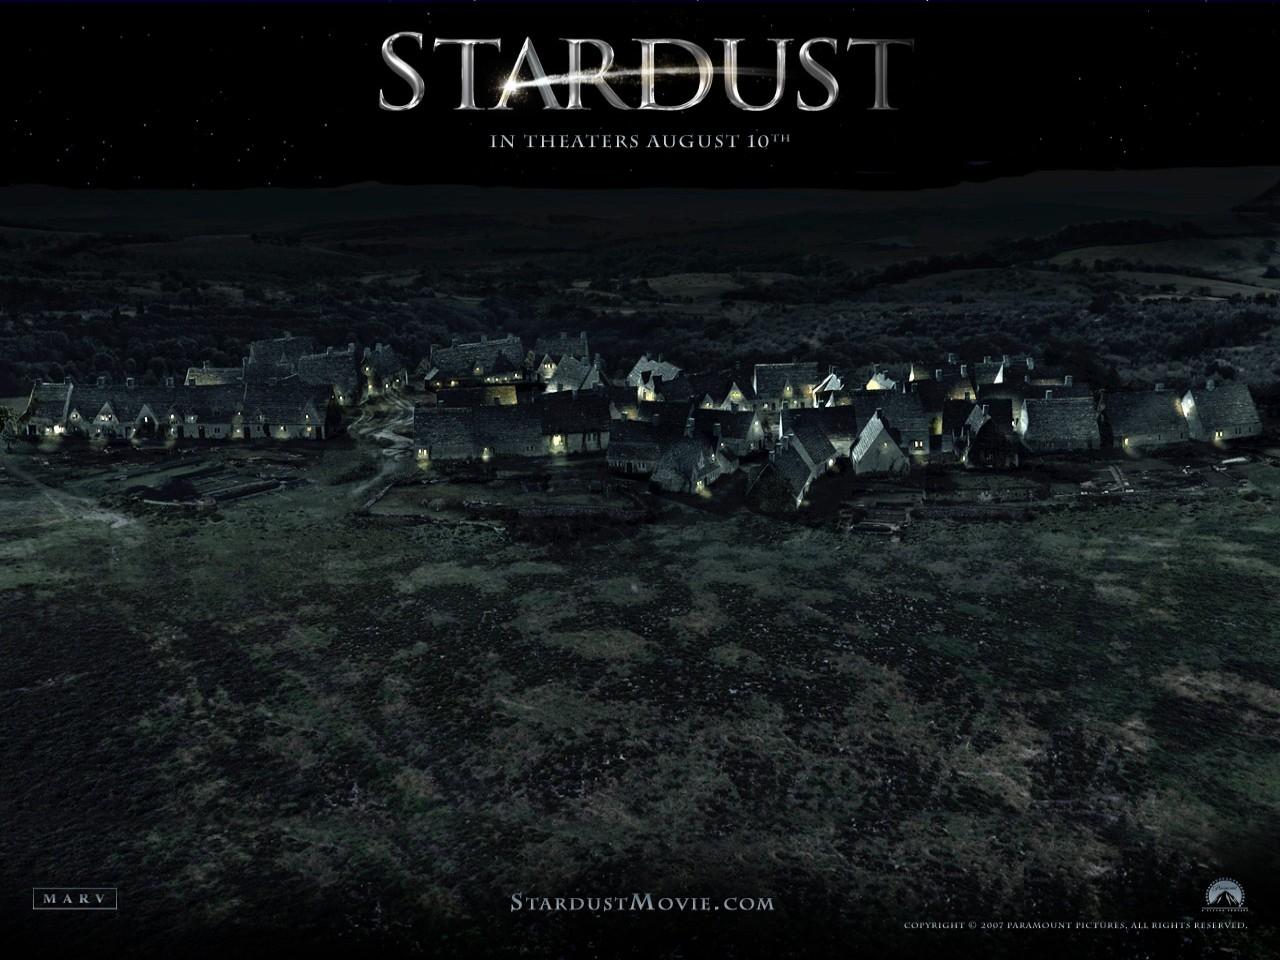 Wallpaper 'notturno' del film Stardust